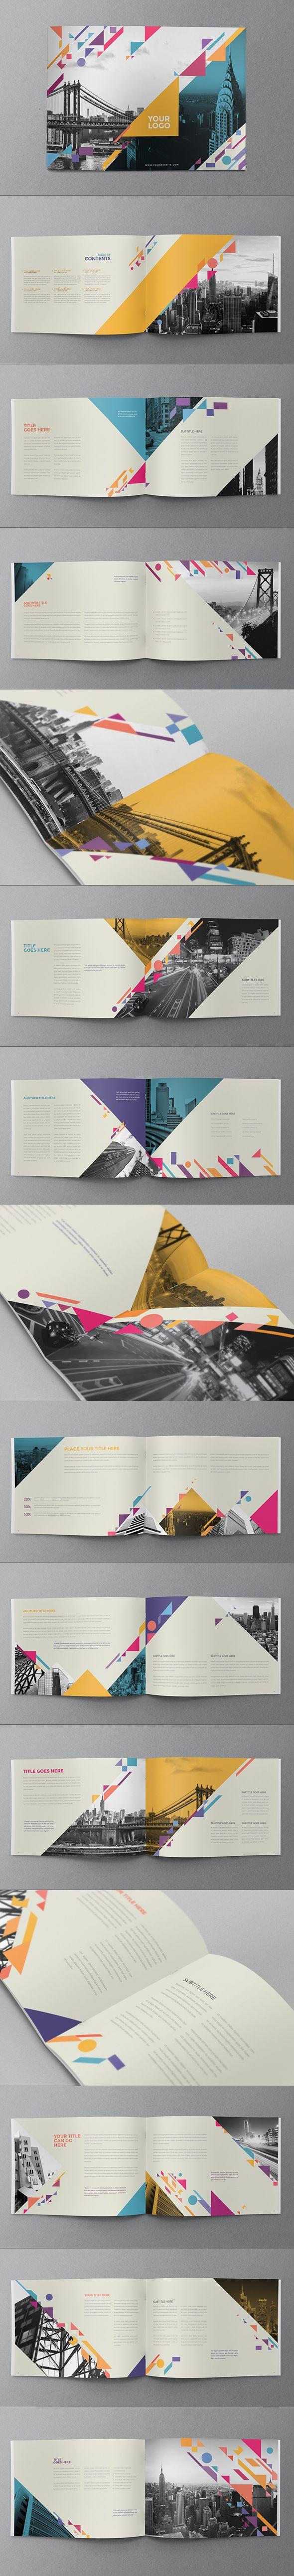 Colorful Shapes Brochure. Download here: http://graphicriver.net/item/colorful-shapes-brochure/9927862?ref=abradesign #design #brochure